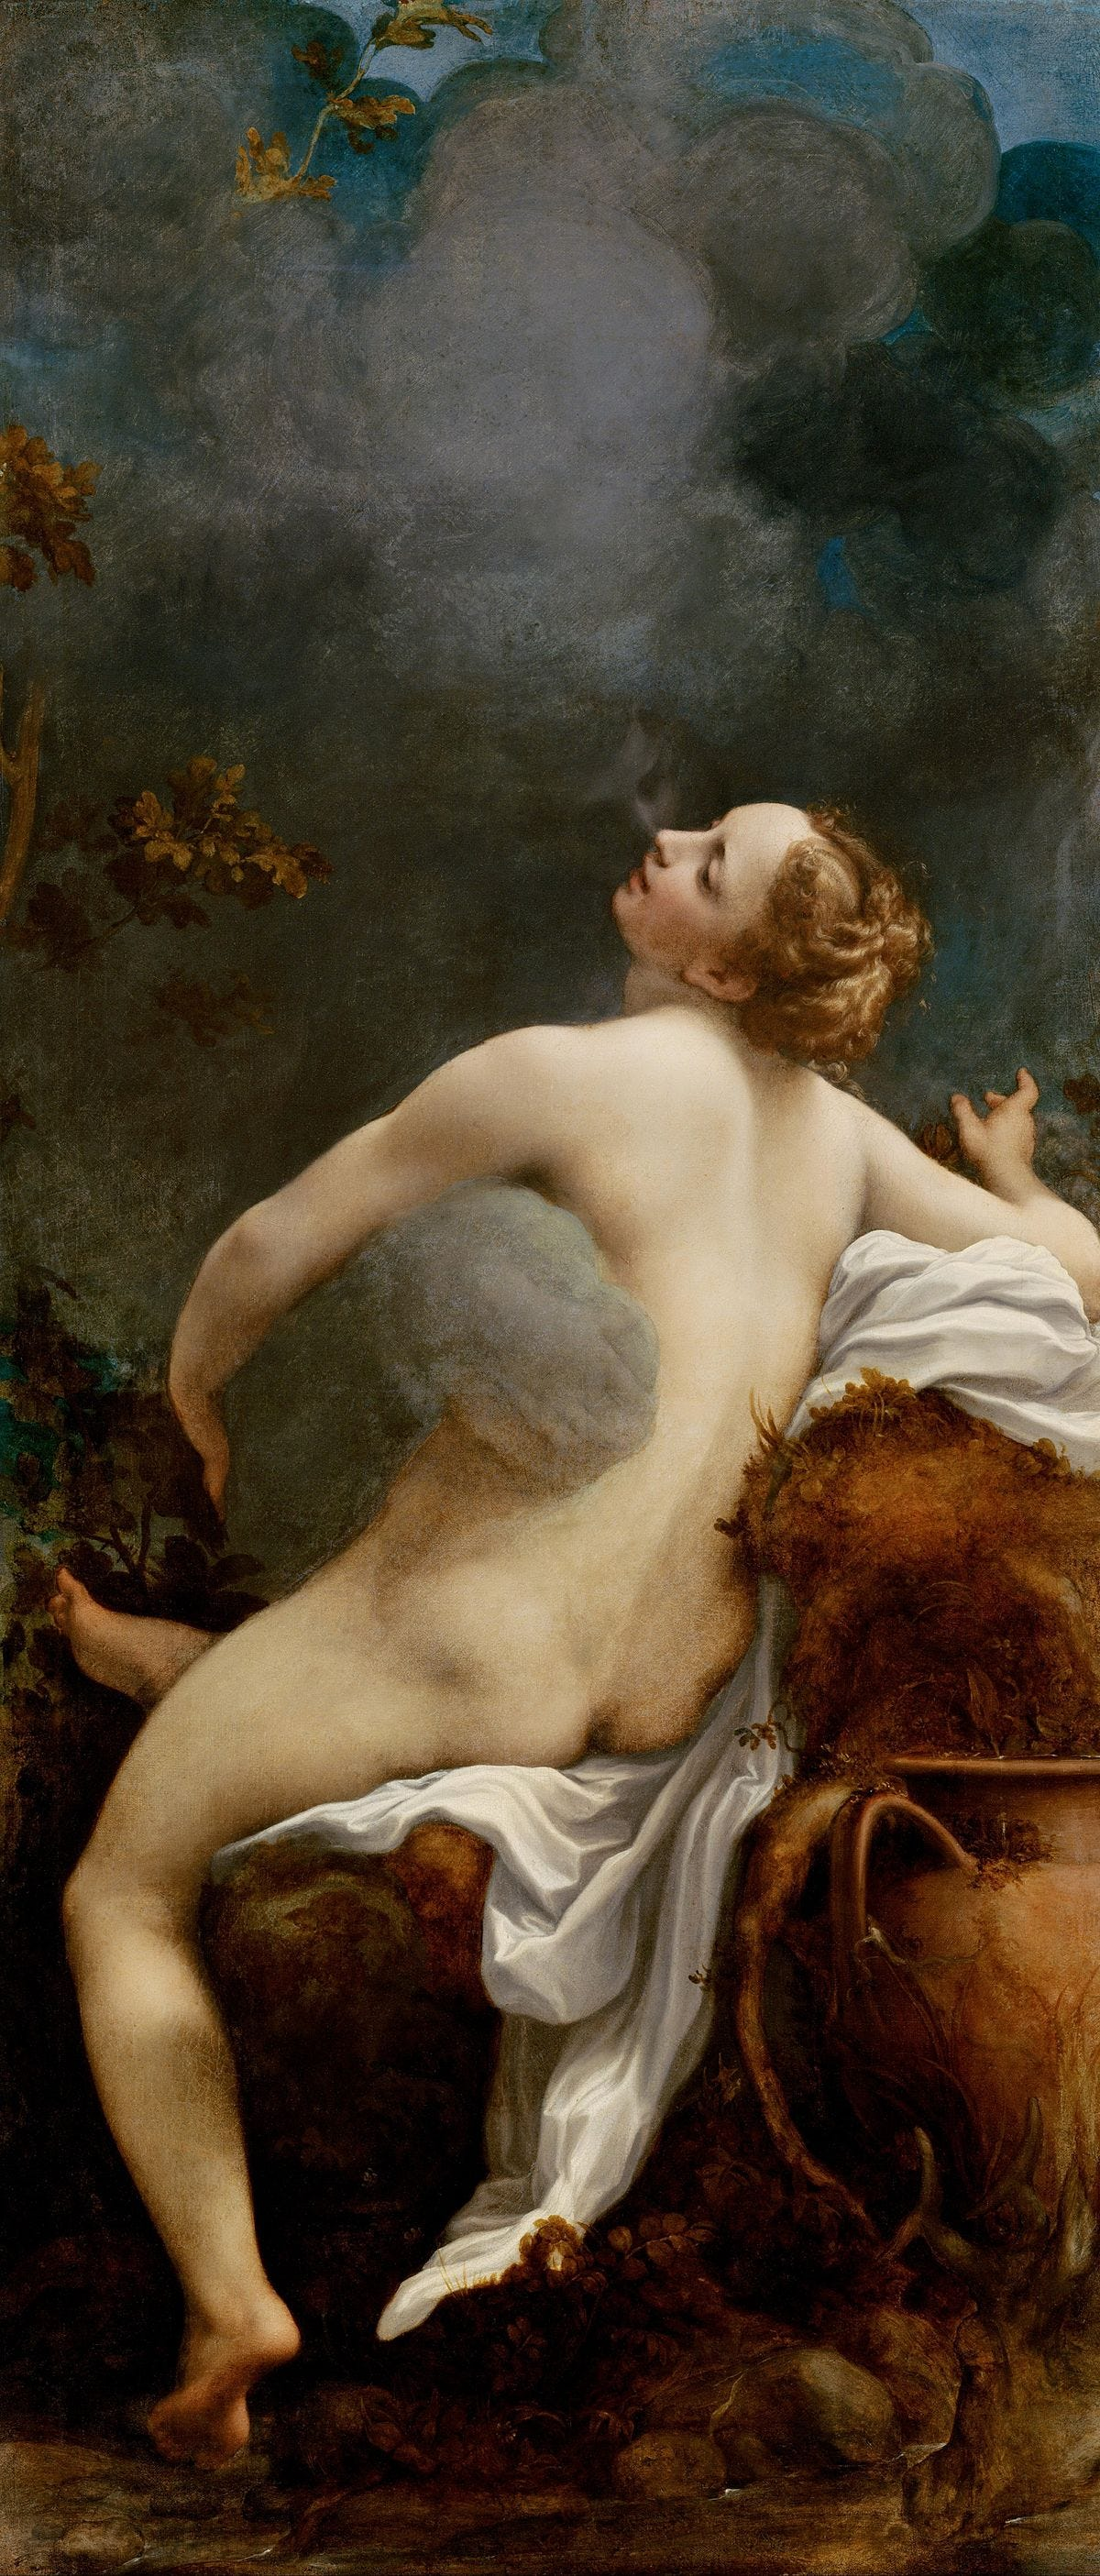 Júpiter e Ío - Wikipedia, la enciclopedia libre